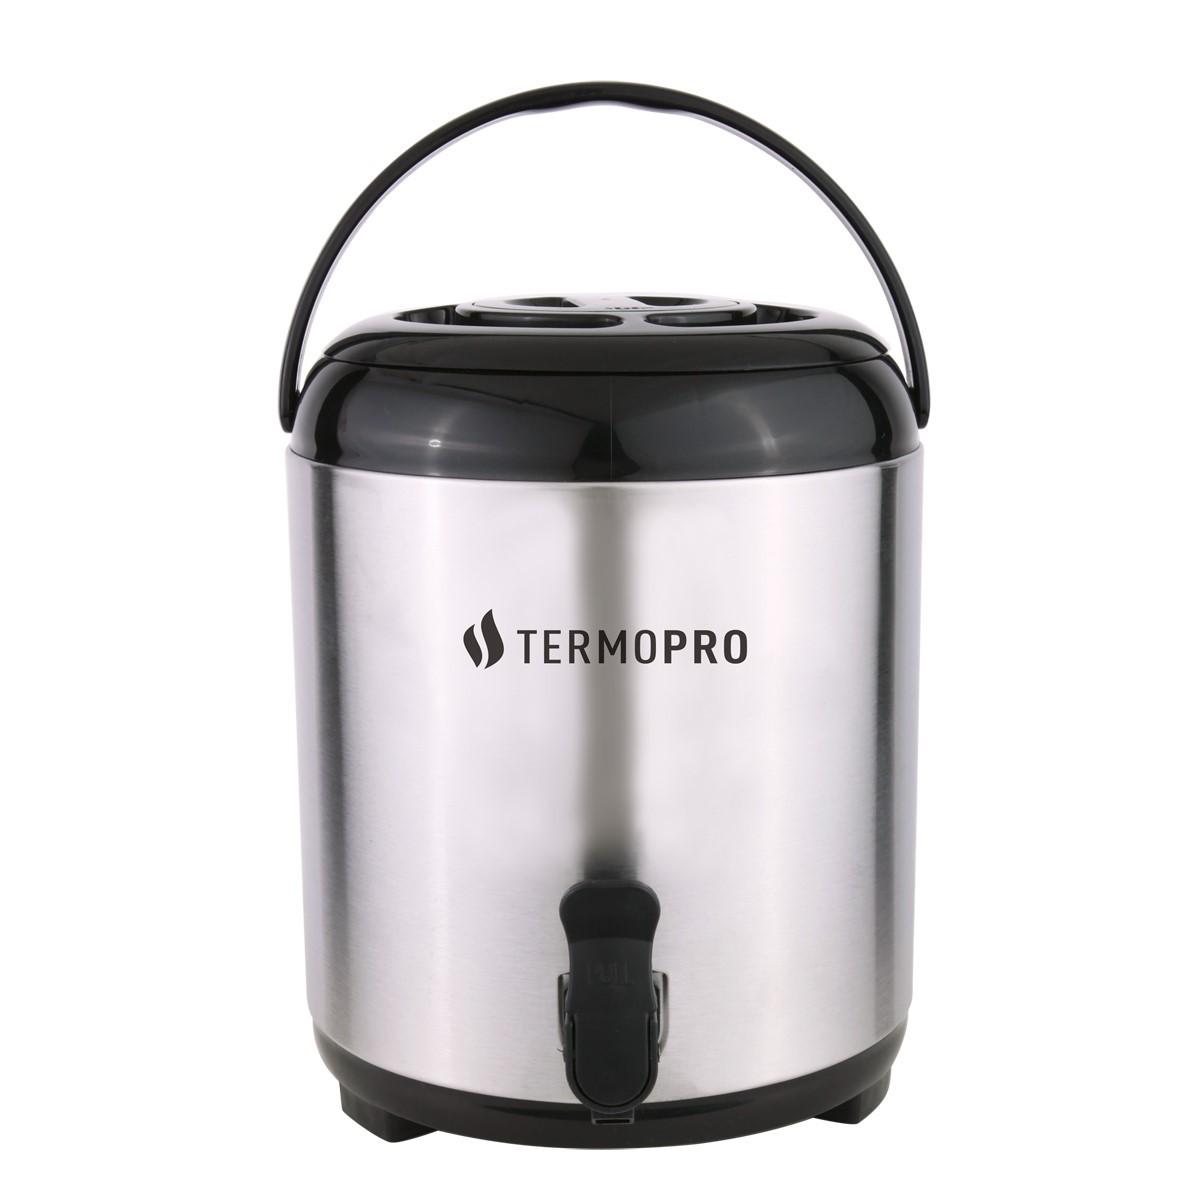 Botijão Térmico 8 Litros Inox Ref:tp6520 - Termopro